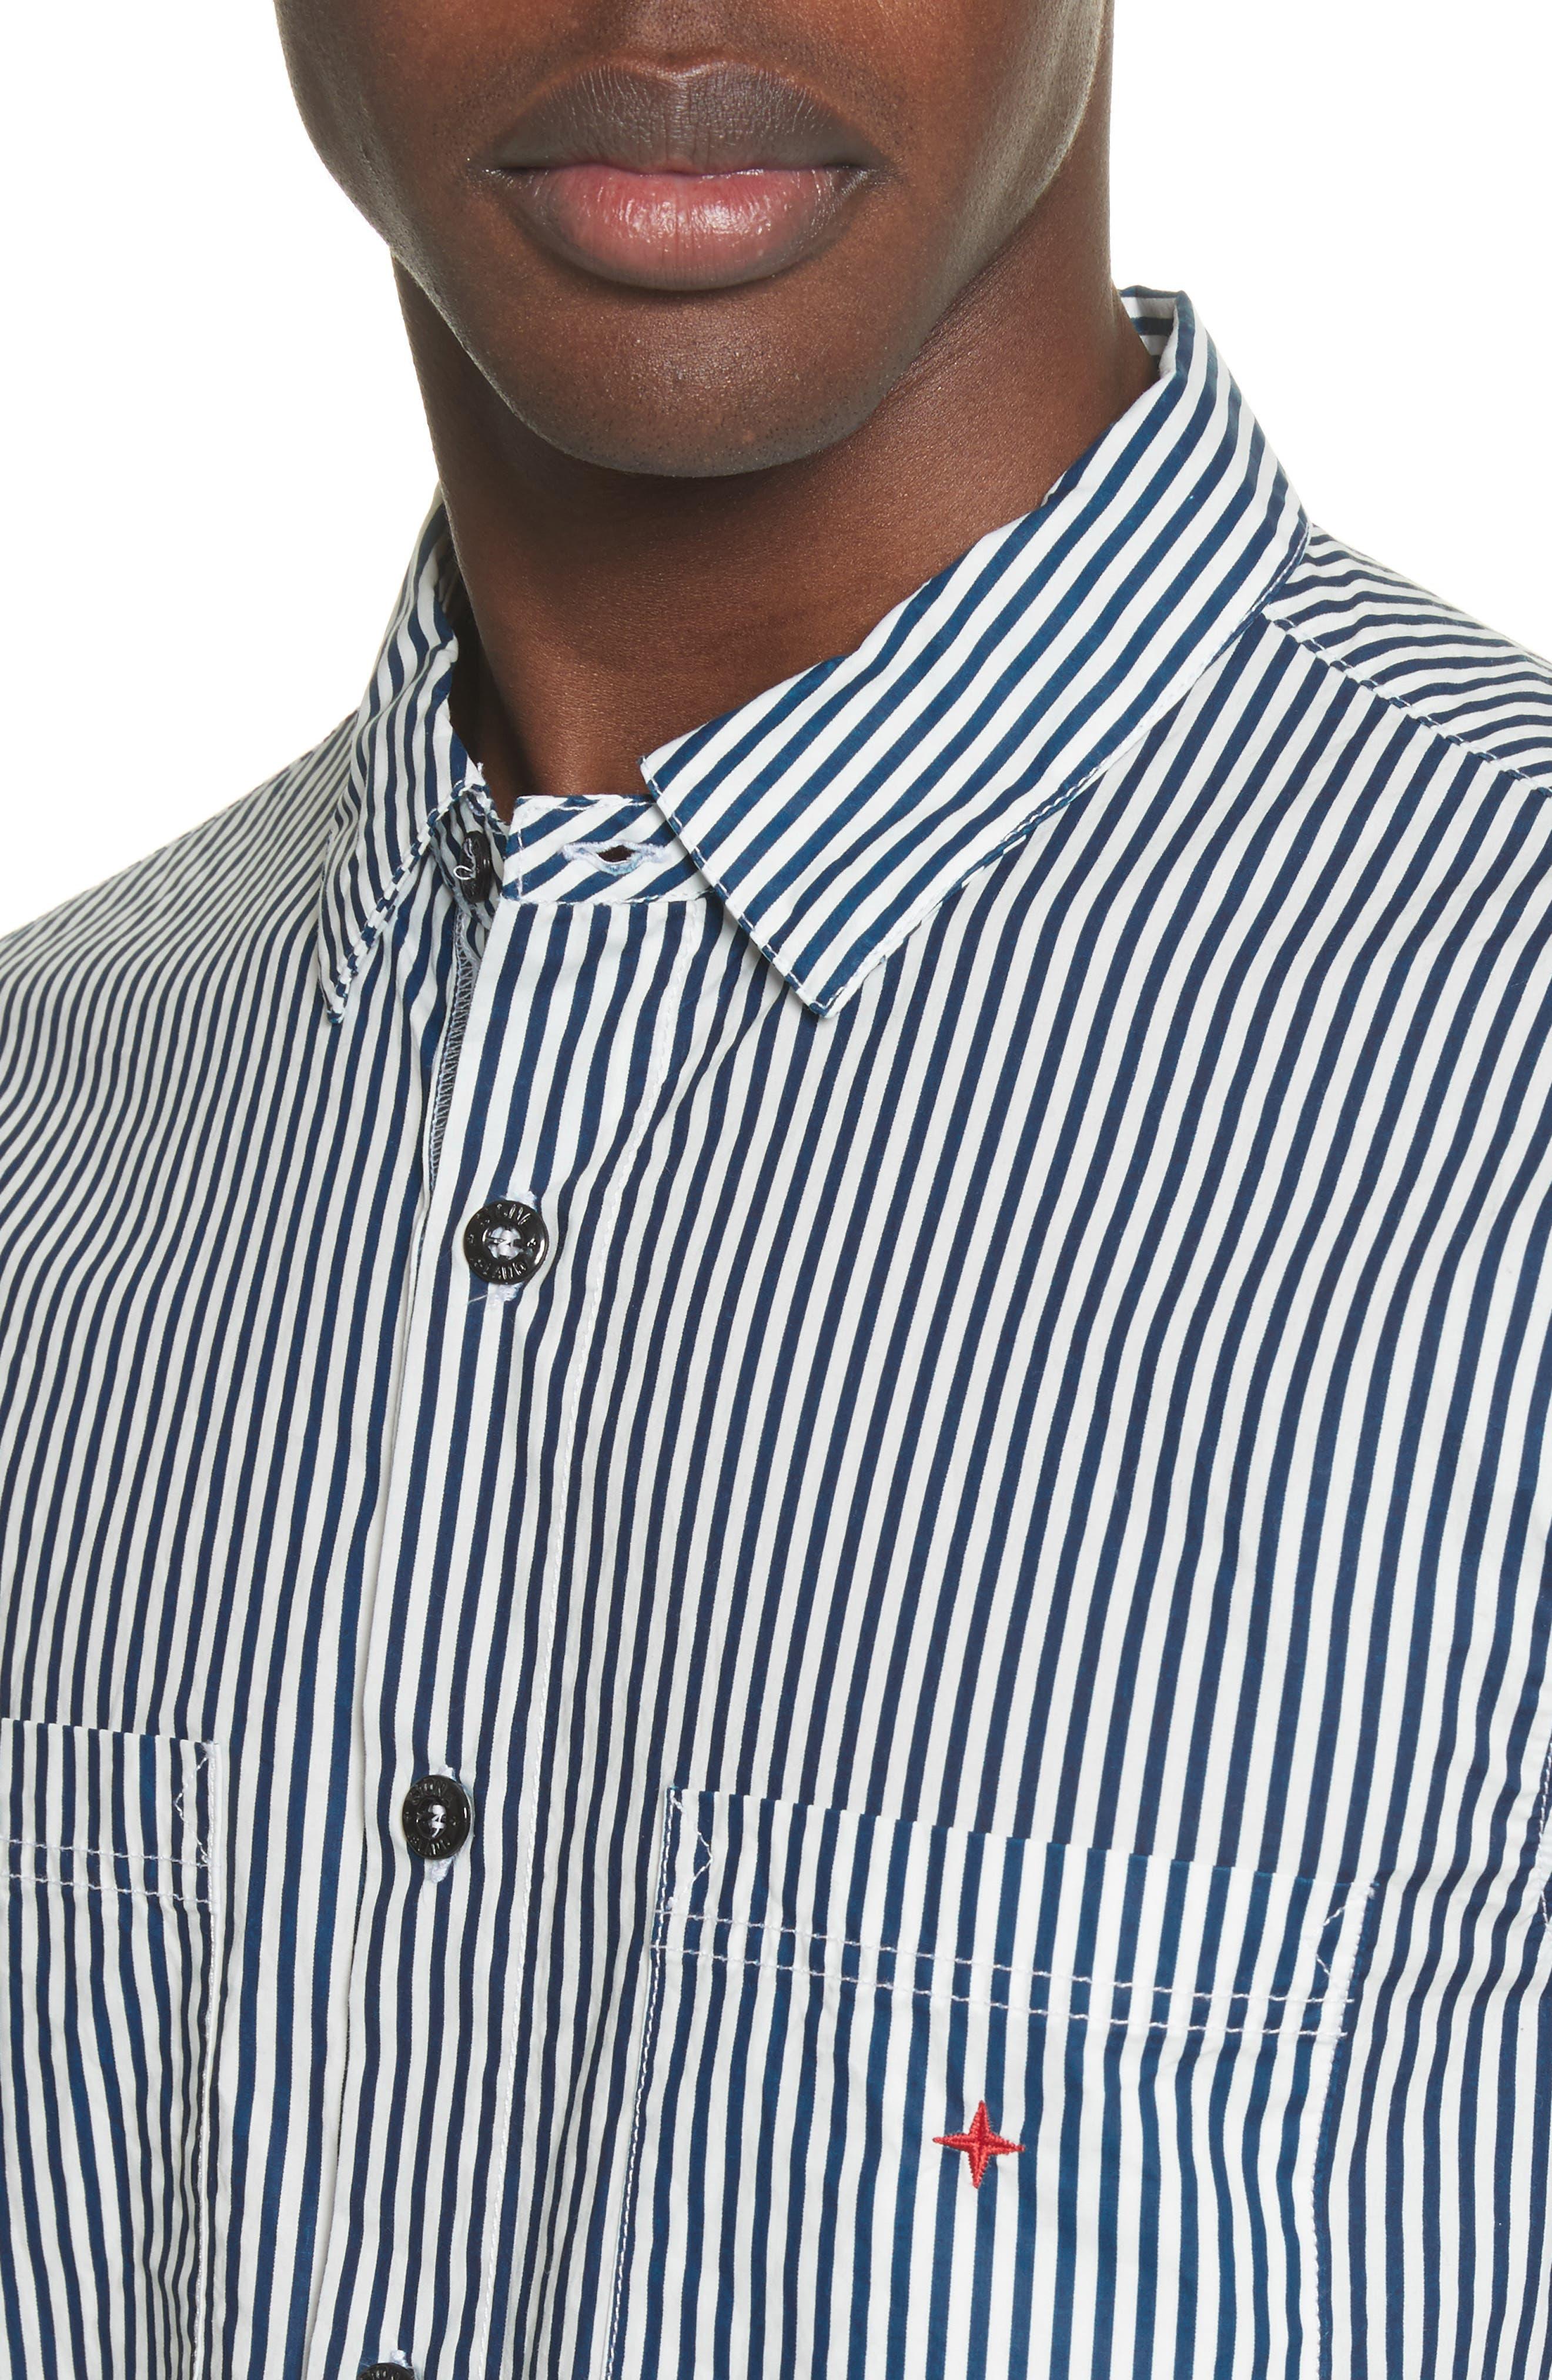 STONE ISLAND,                             Stripe Woven Shirt,                             Alternate thumbnail 4, color,                             100